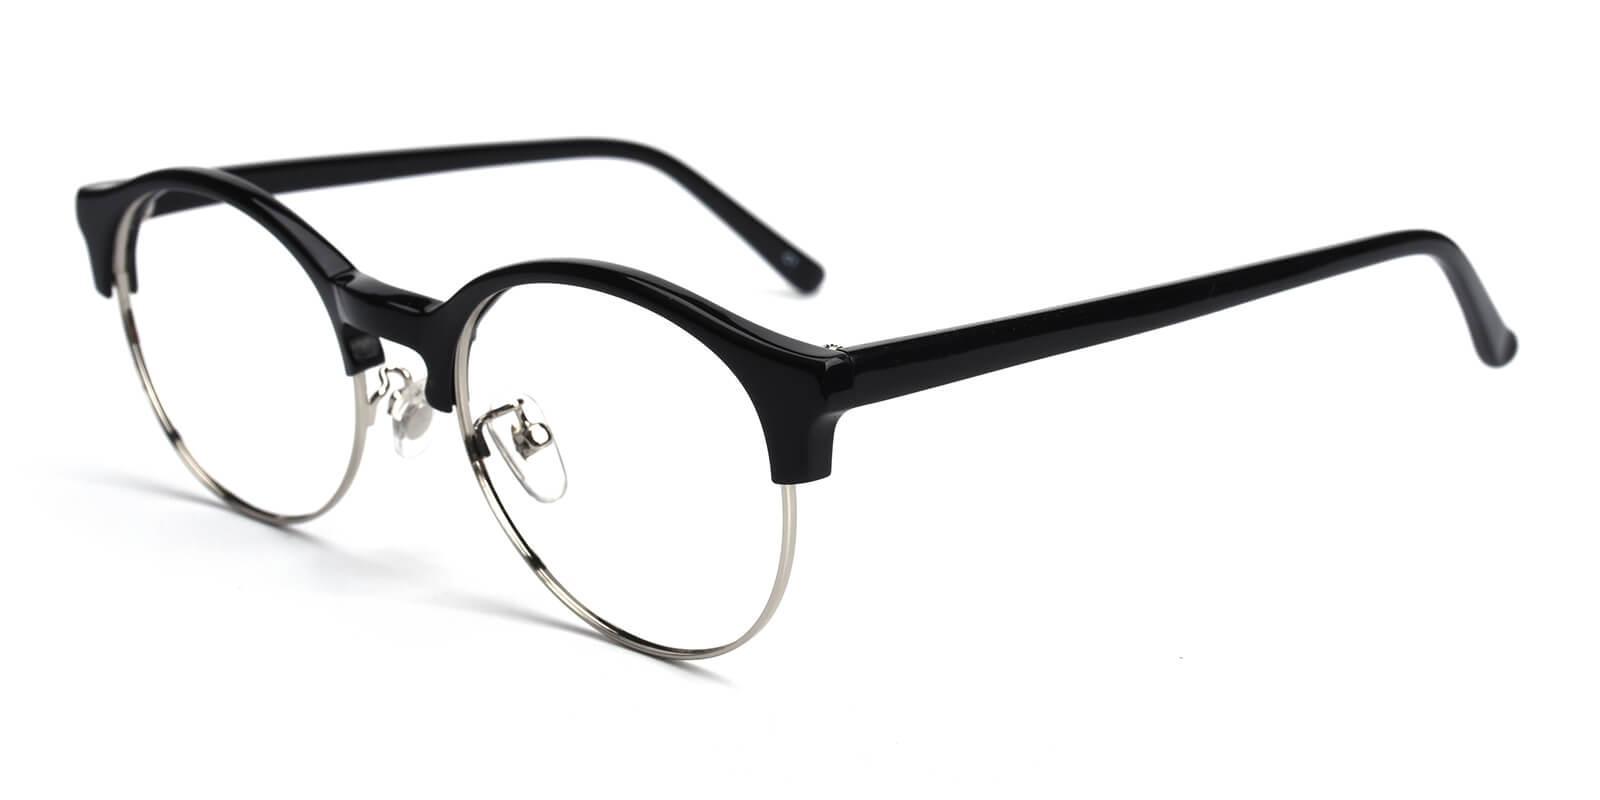 Zenoria-Black-Browline-Combination-Eyeglasses-additional1